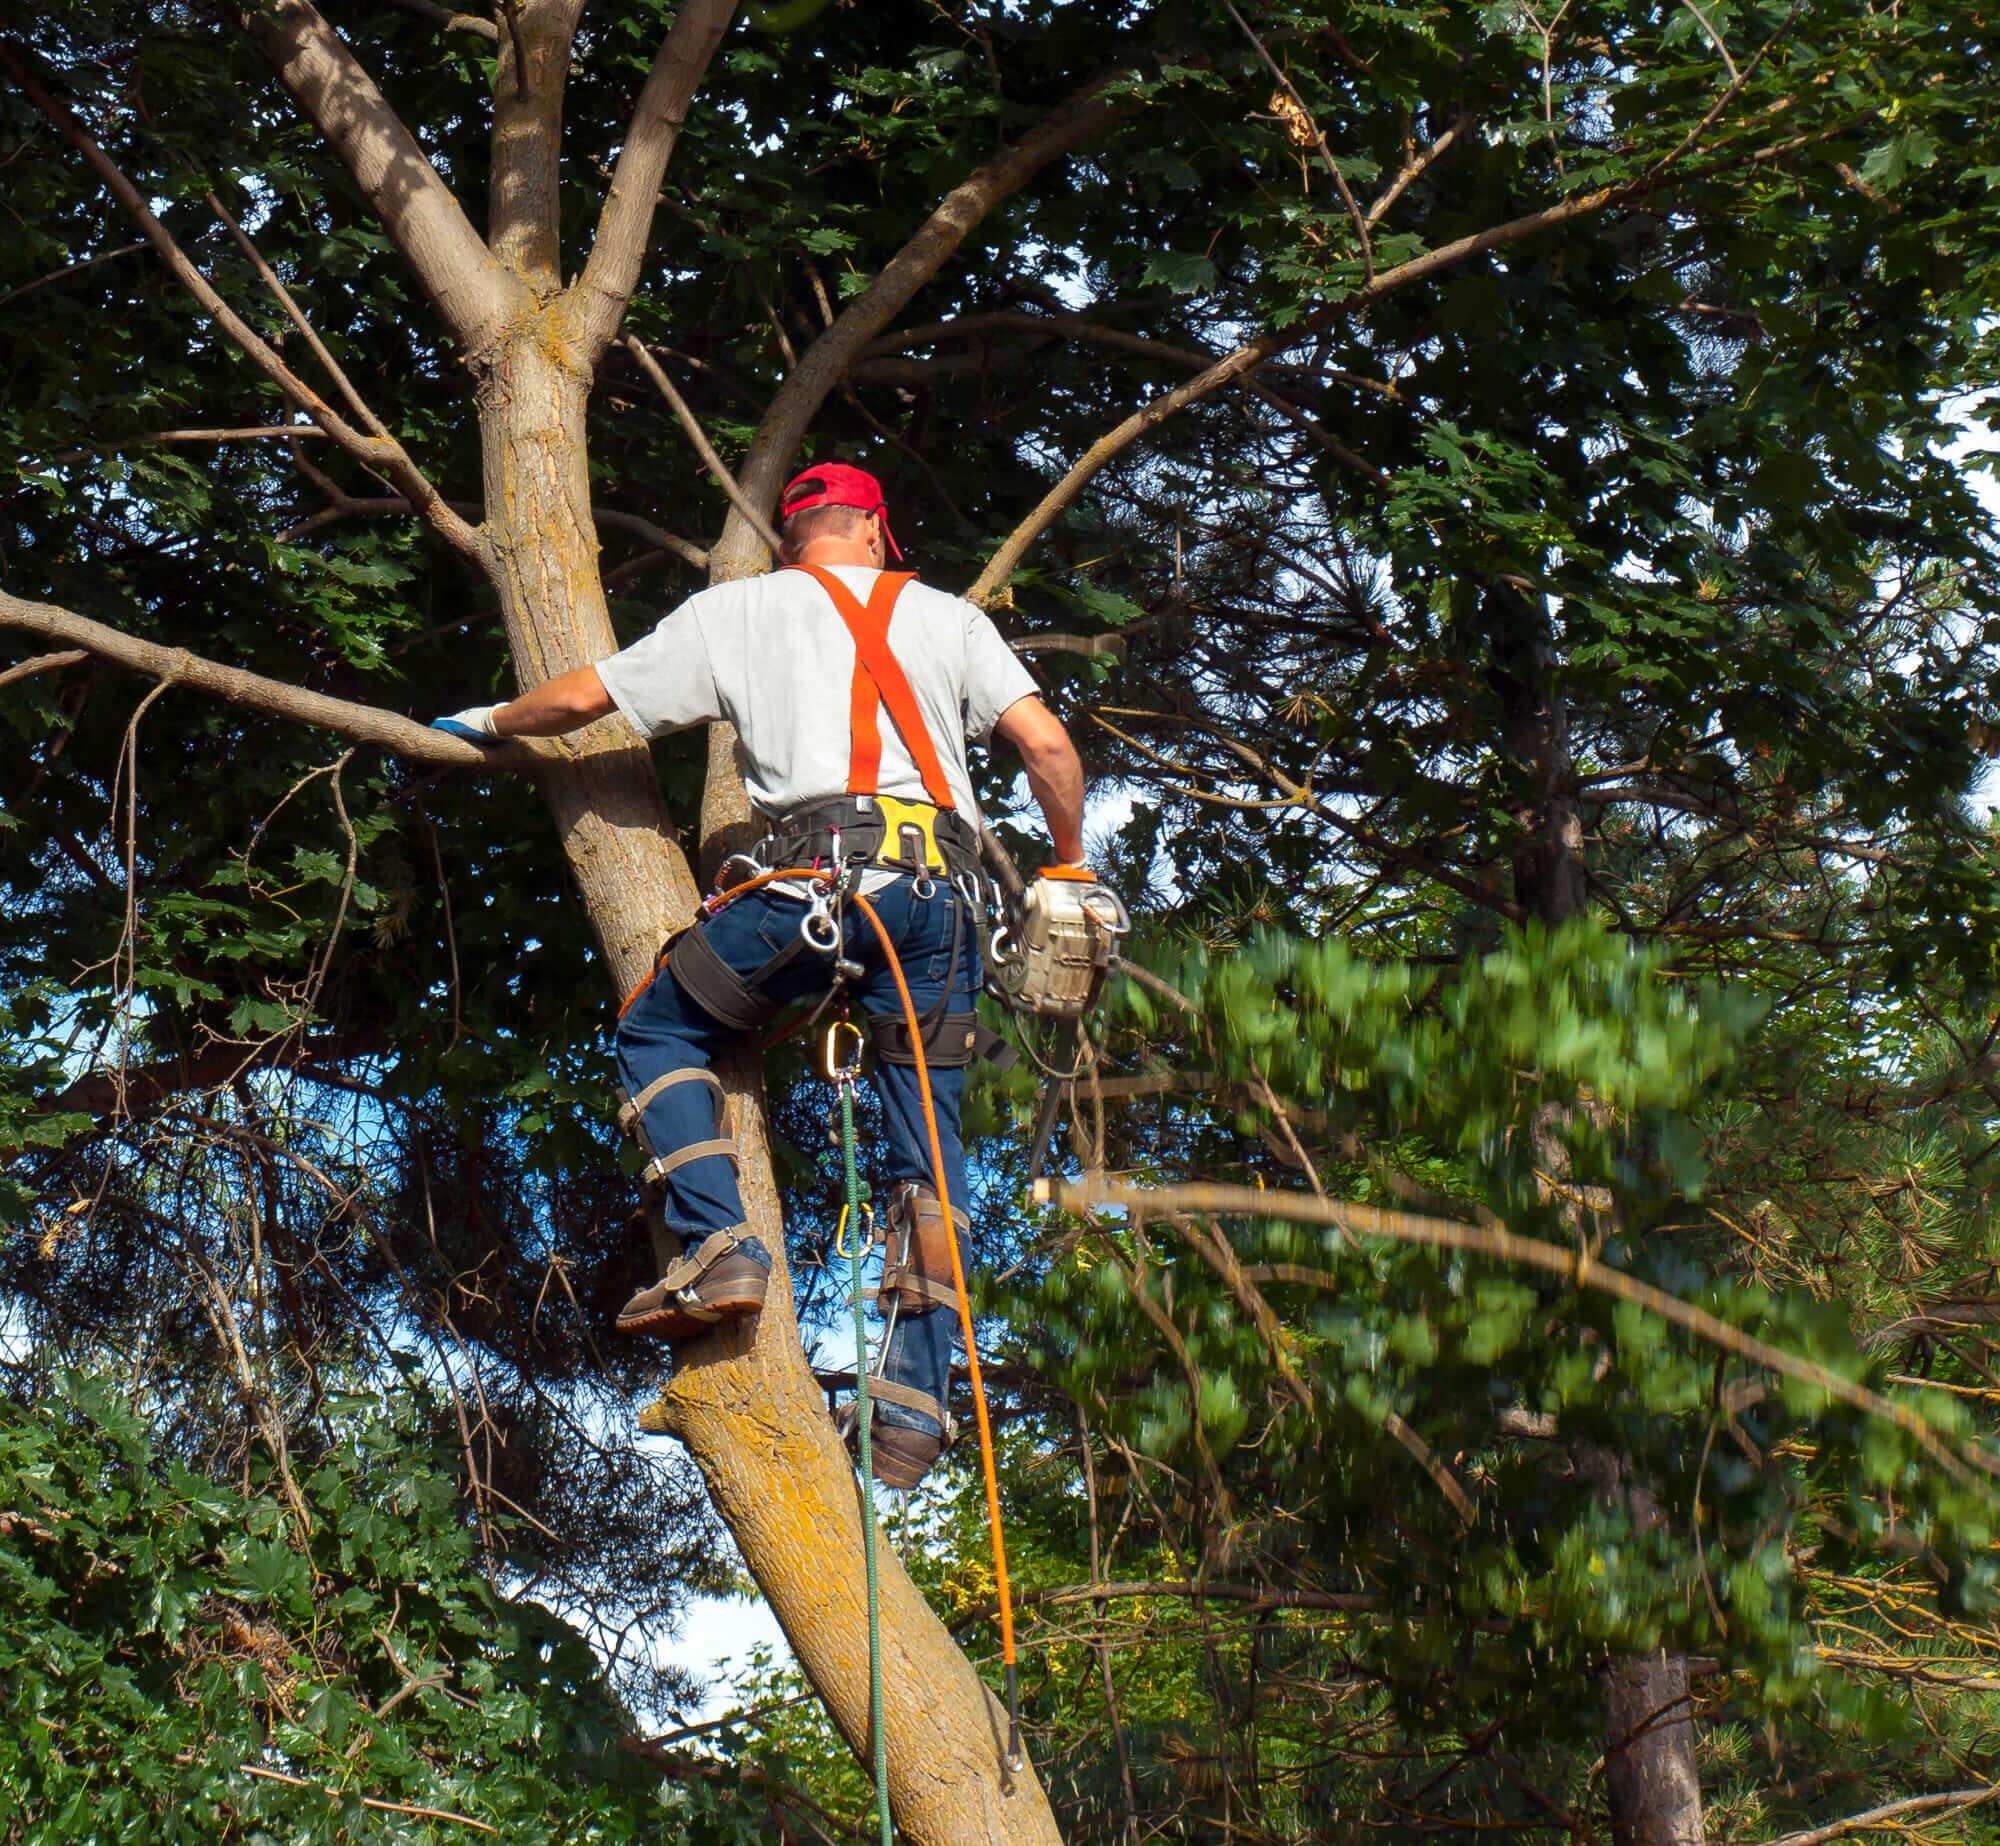 tree arborist trimming a tree - Big Easy Tree Removal